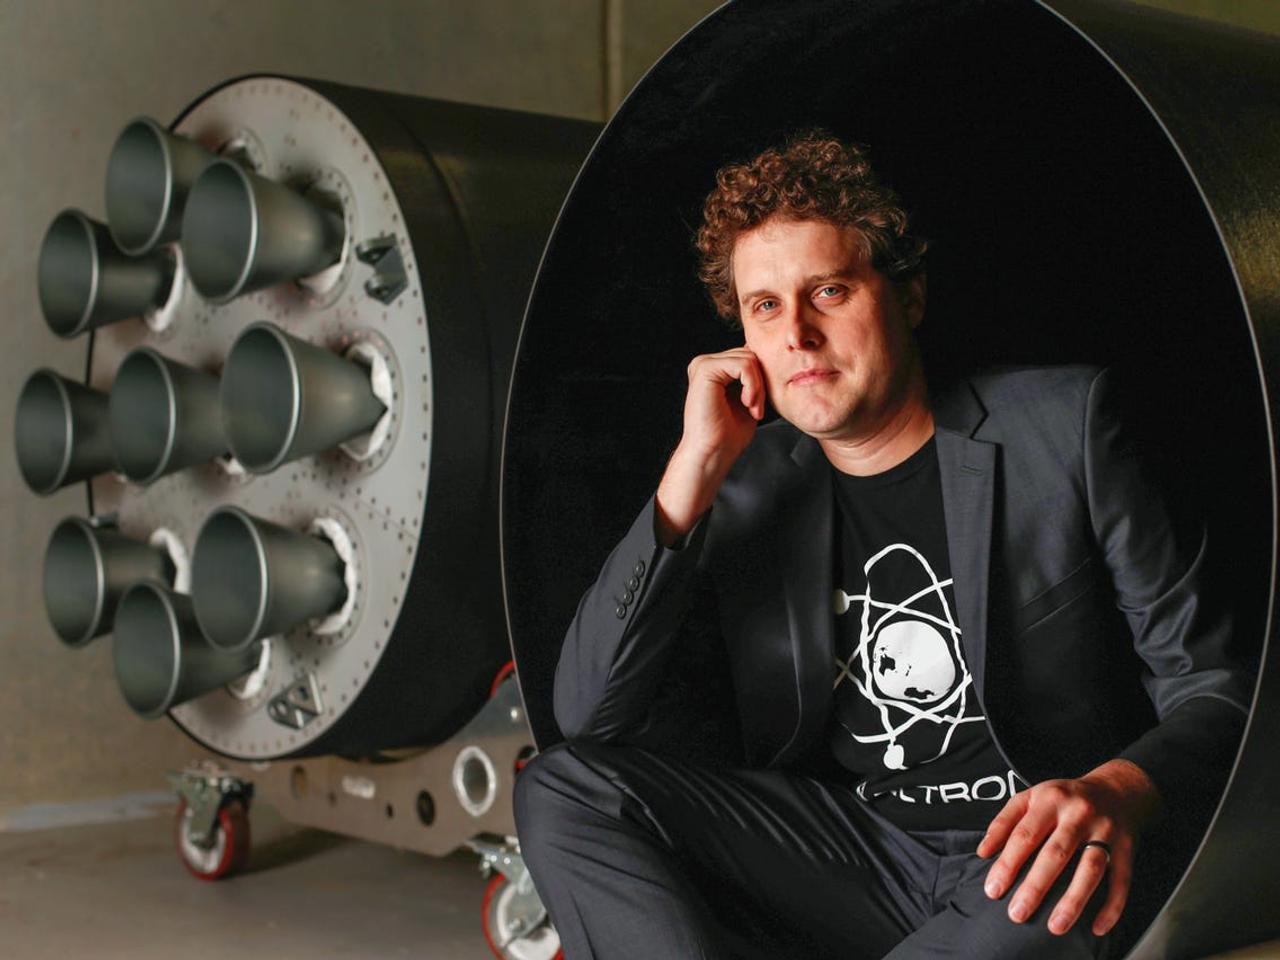 Rocket Lab хочет подвинуть SpaceX, создав многоразовую ракету Neutron для доставки астронавтов на Луну и Марс